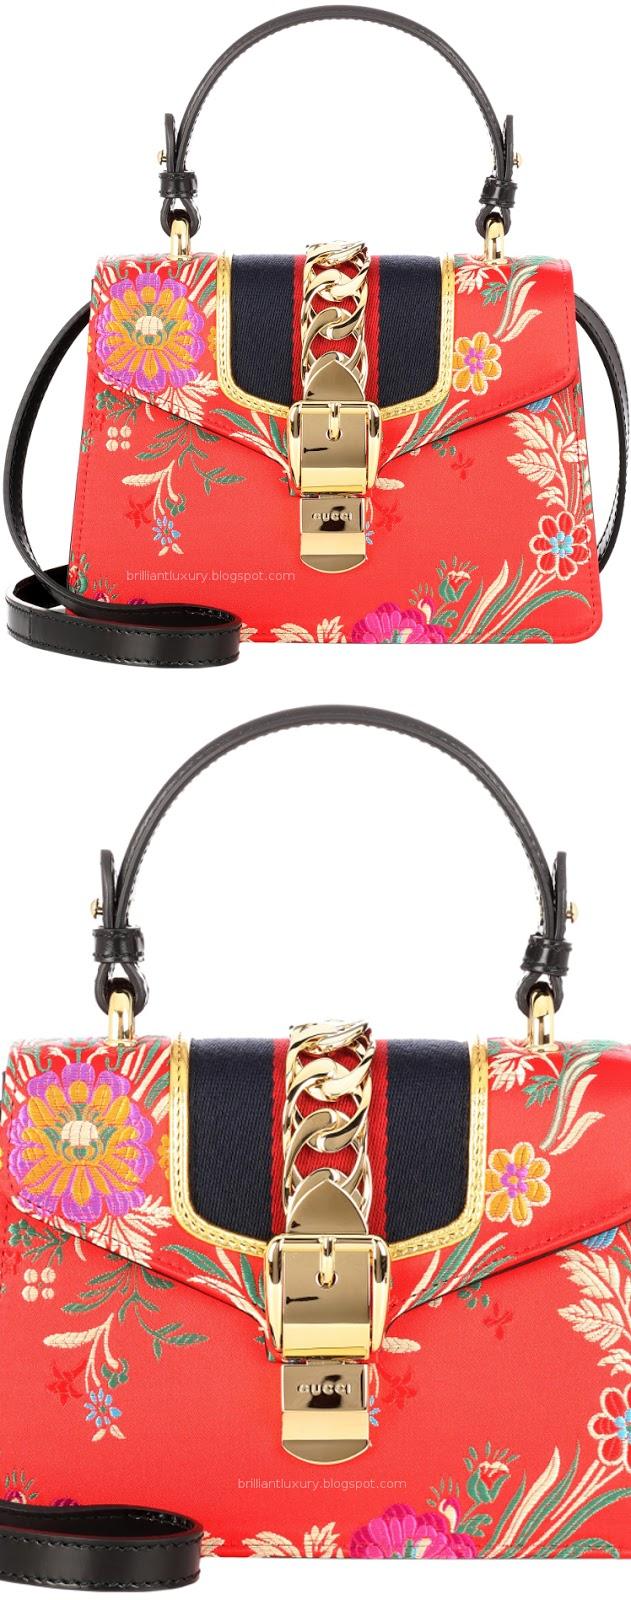 Brilliant Luxury ♦ Gucci Sylvie mini red satin shoulder bag